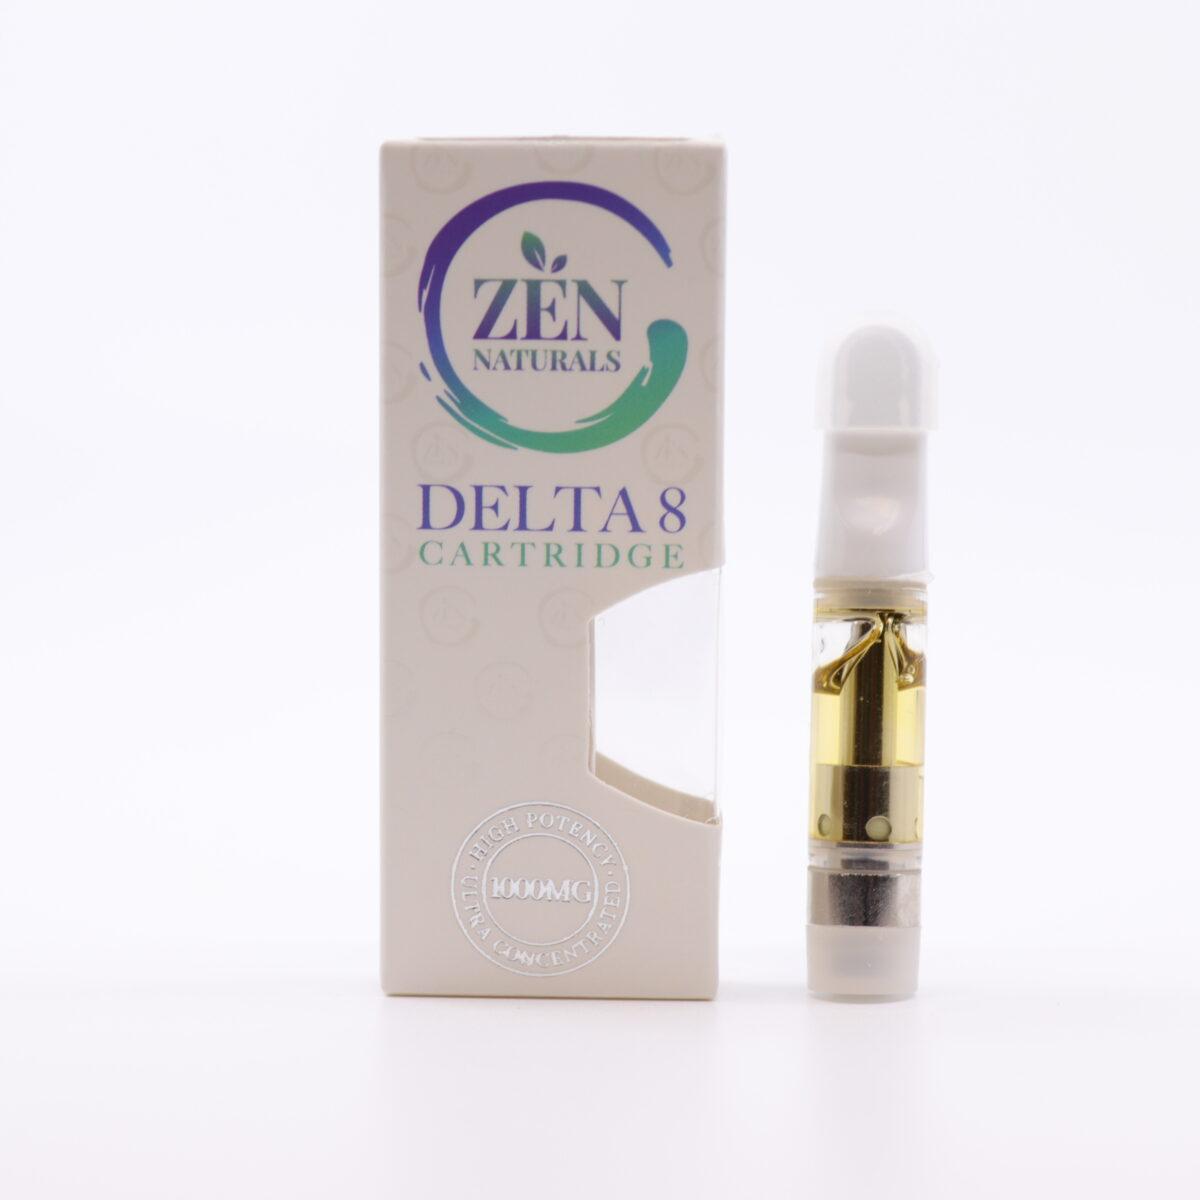 Zen Naturals Delta 8